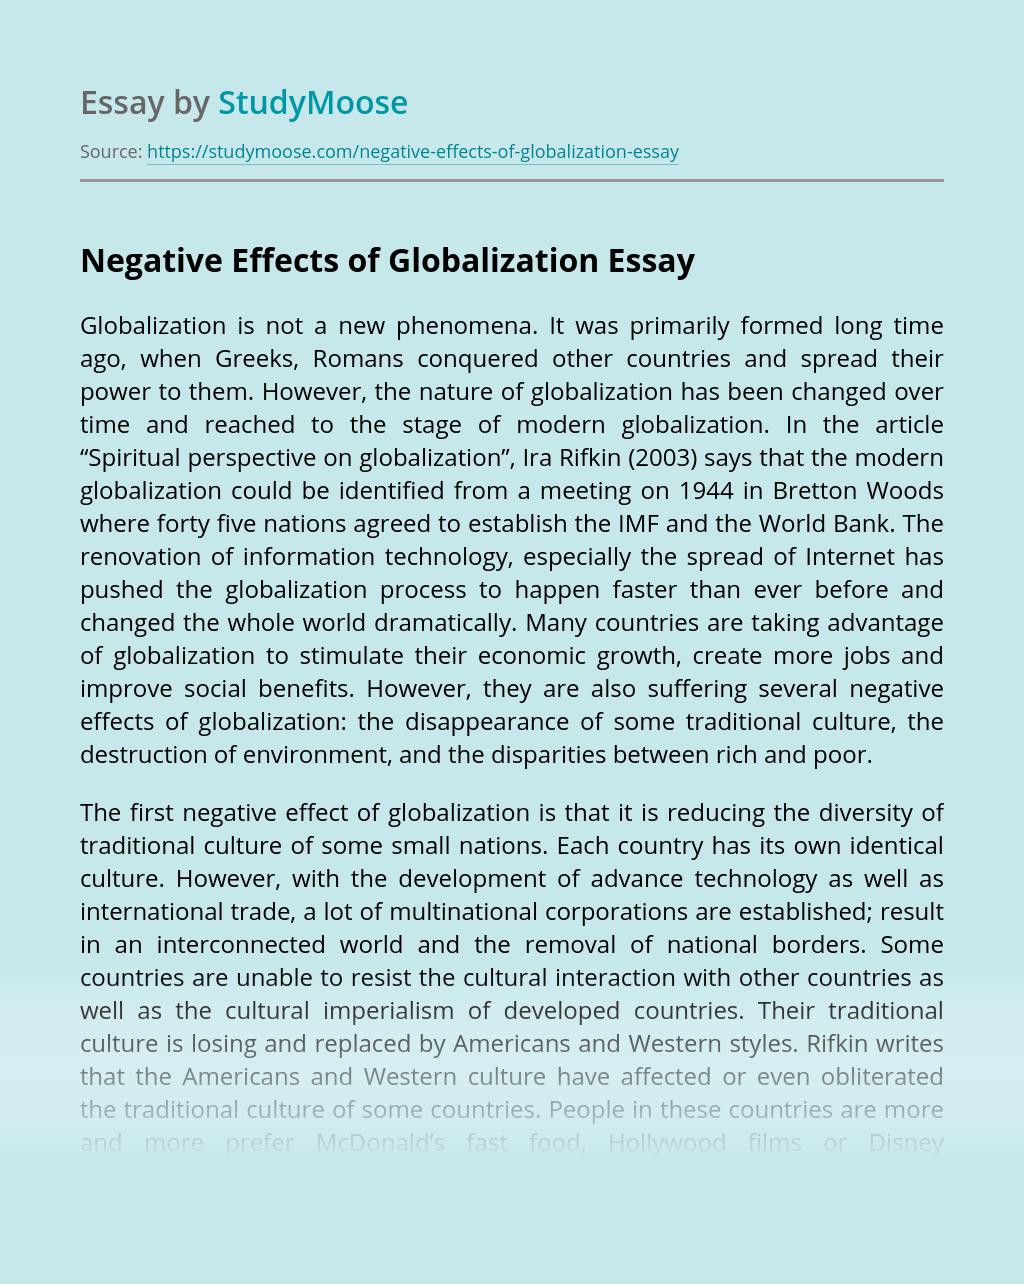 Negative Effects of Globalization